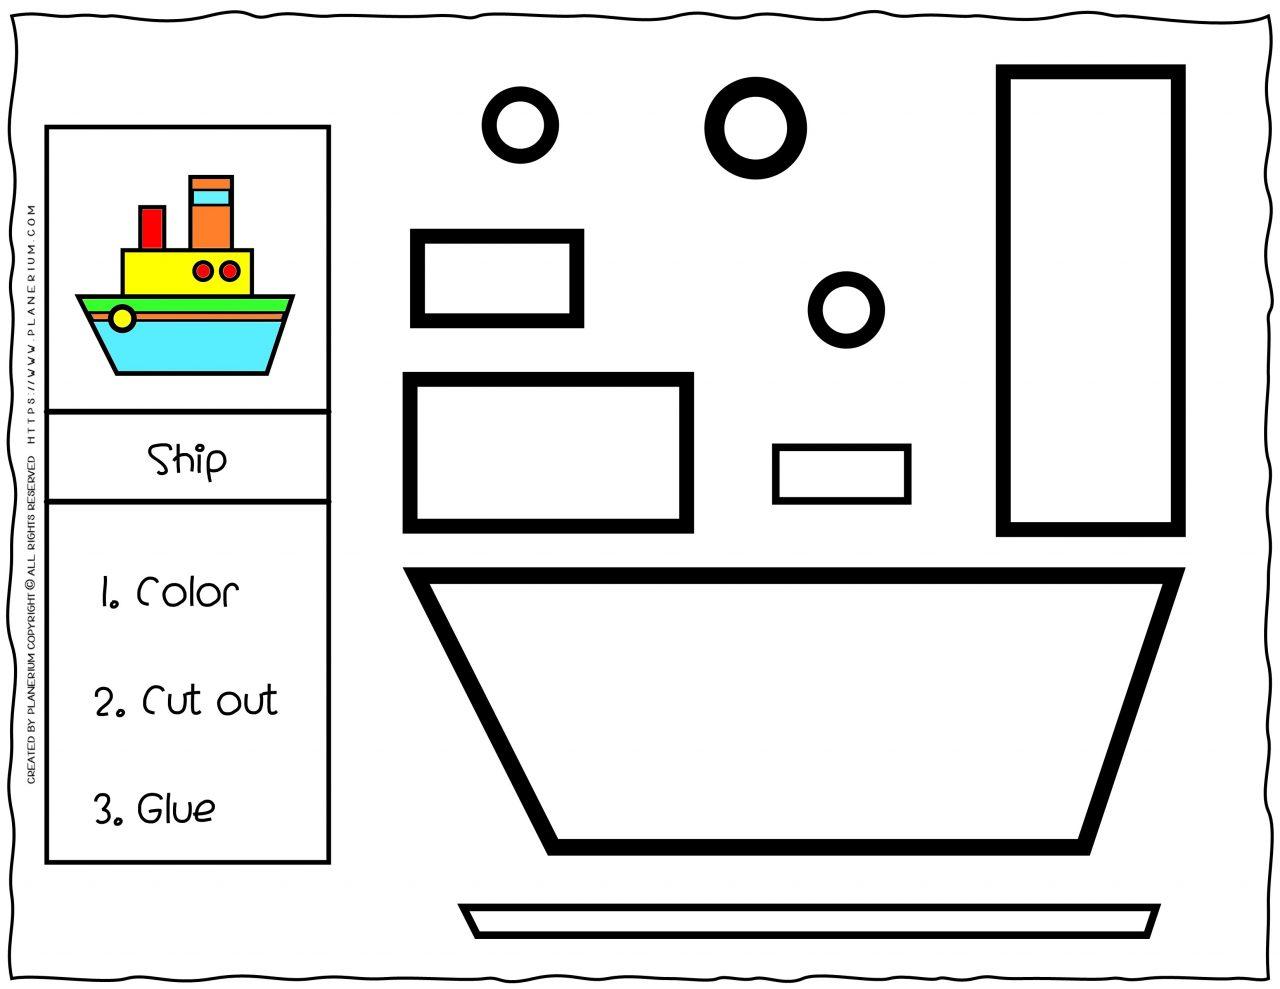 Cut and Glue Worksheet - Ship | Planerium